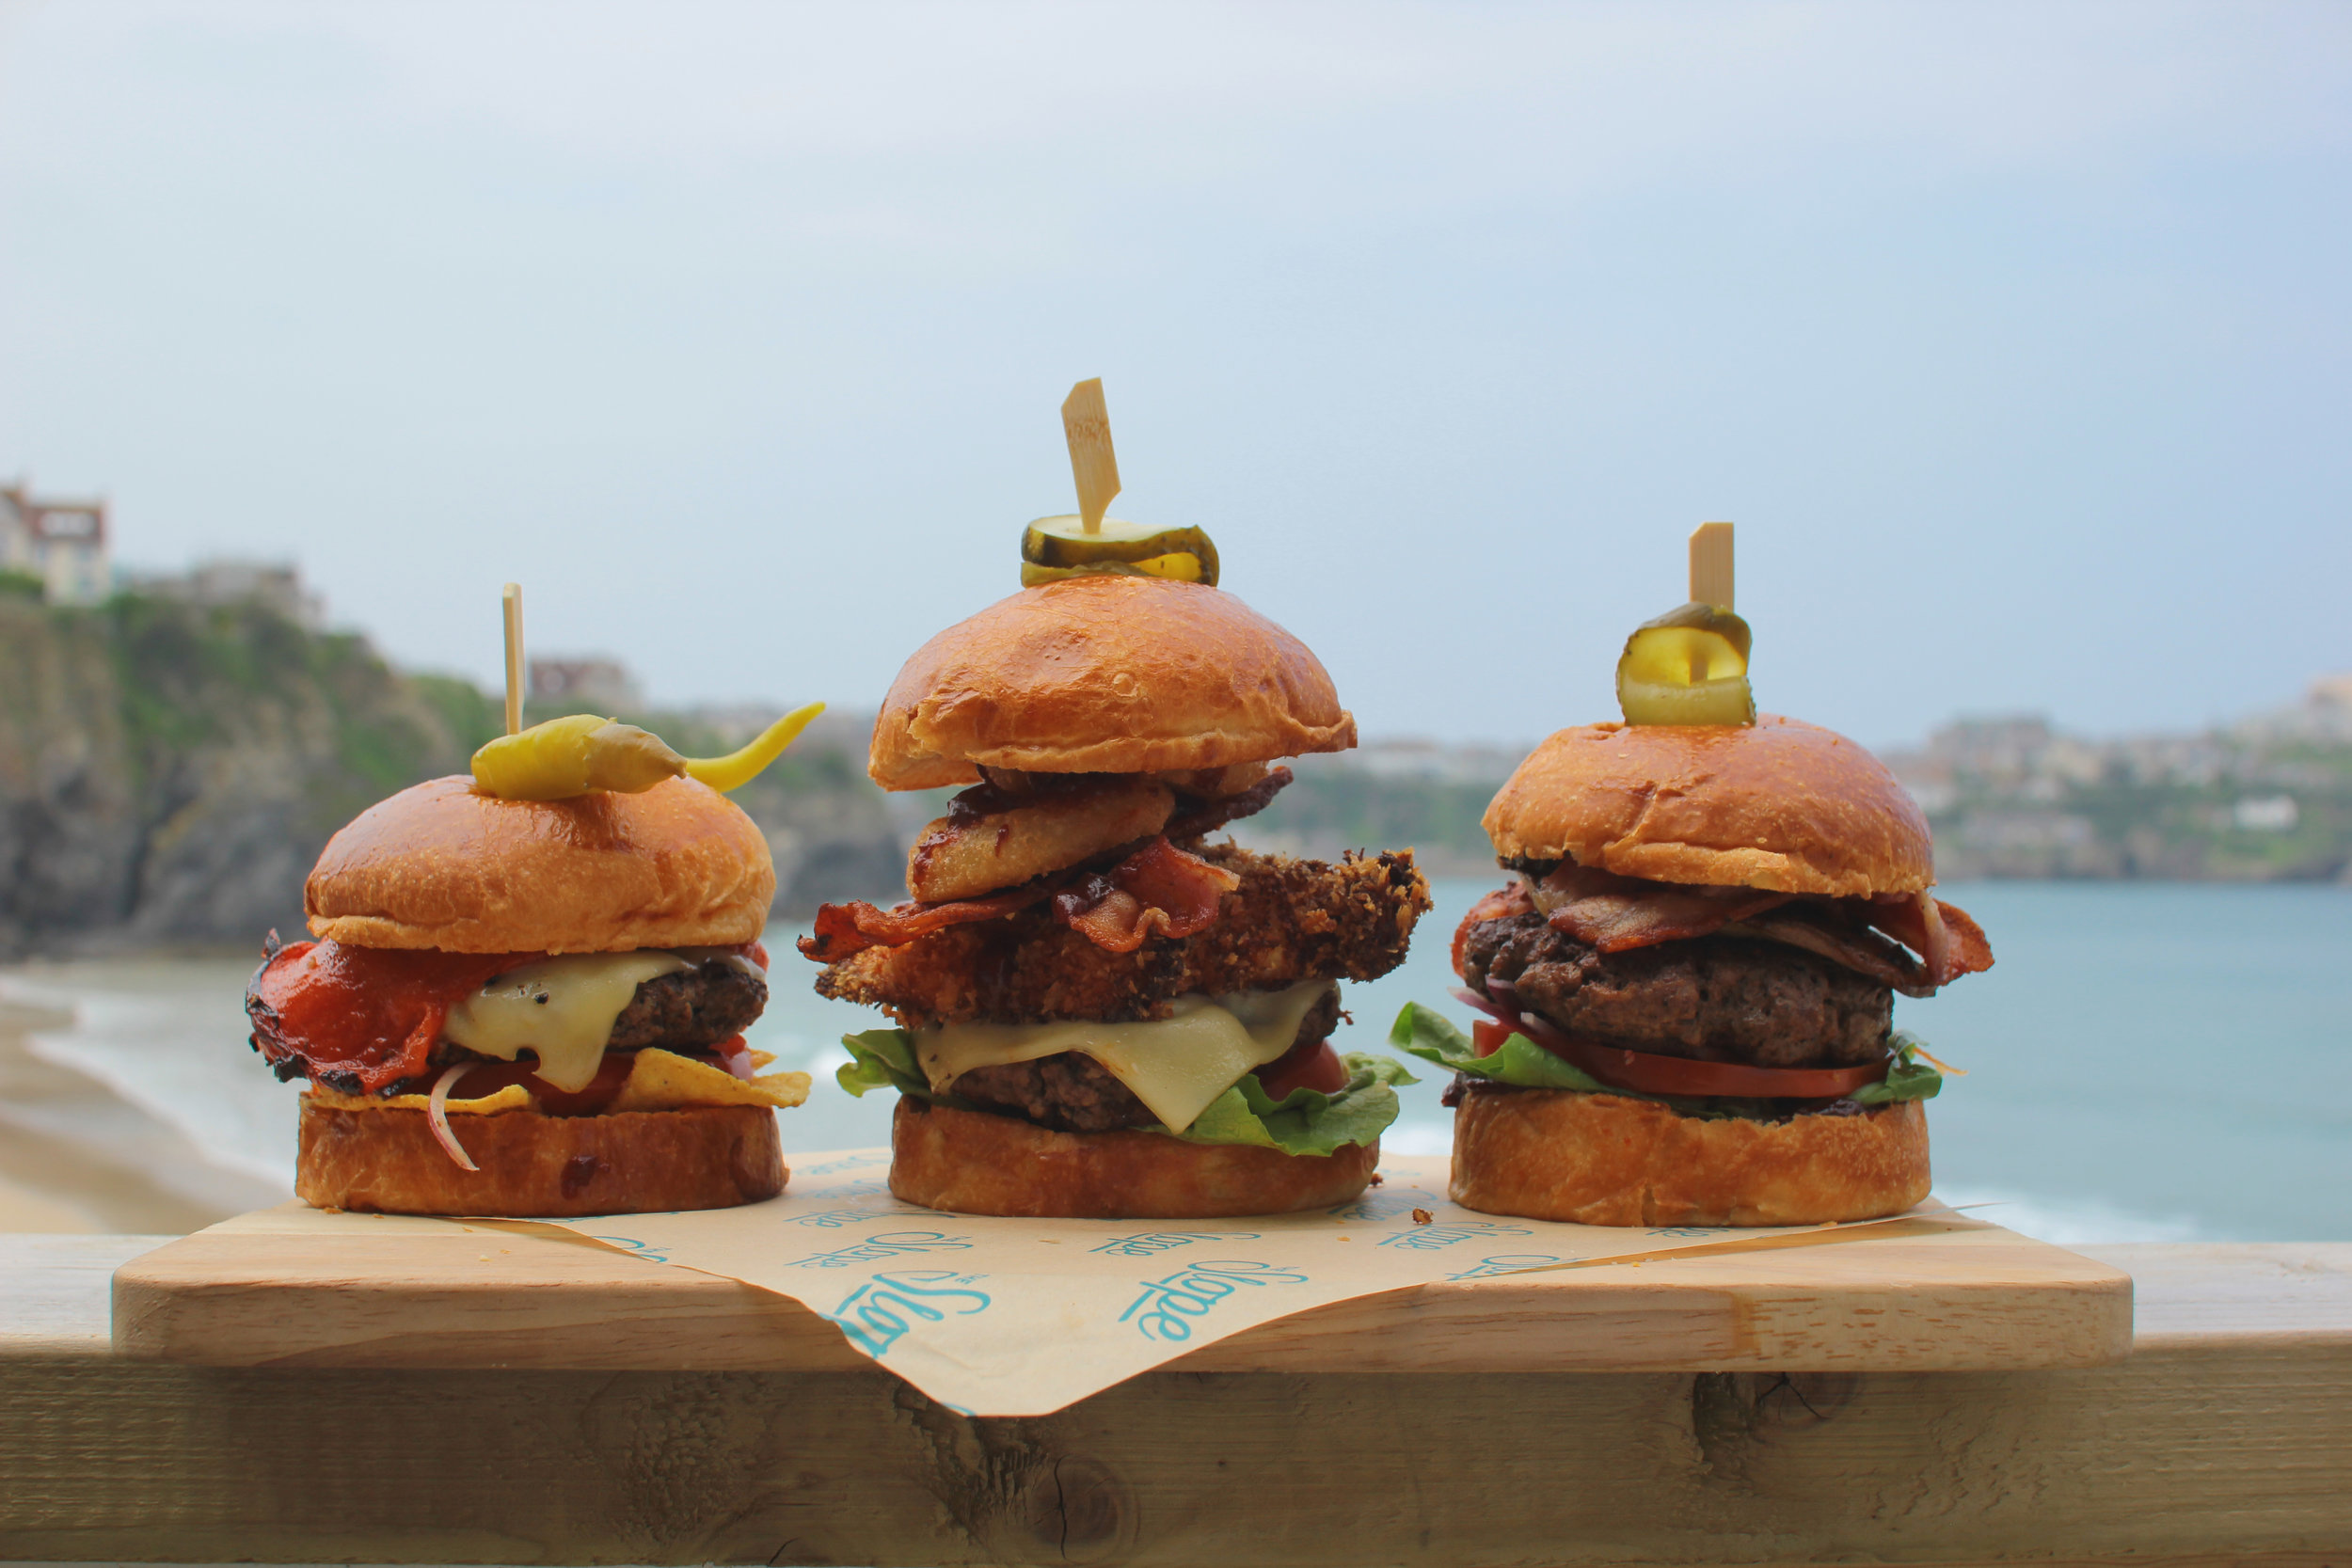 3 new burger photo.jpg